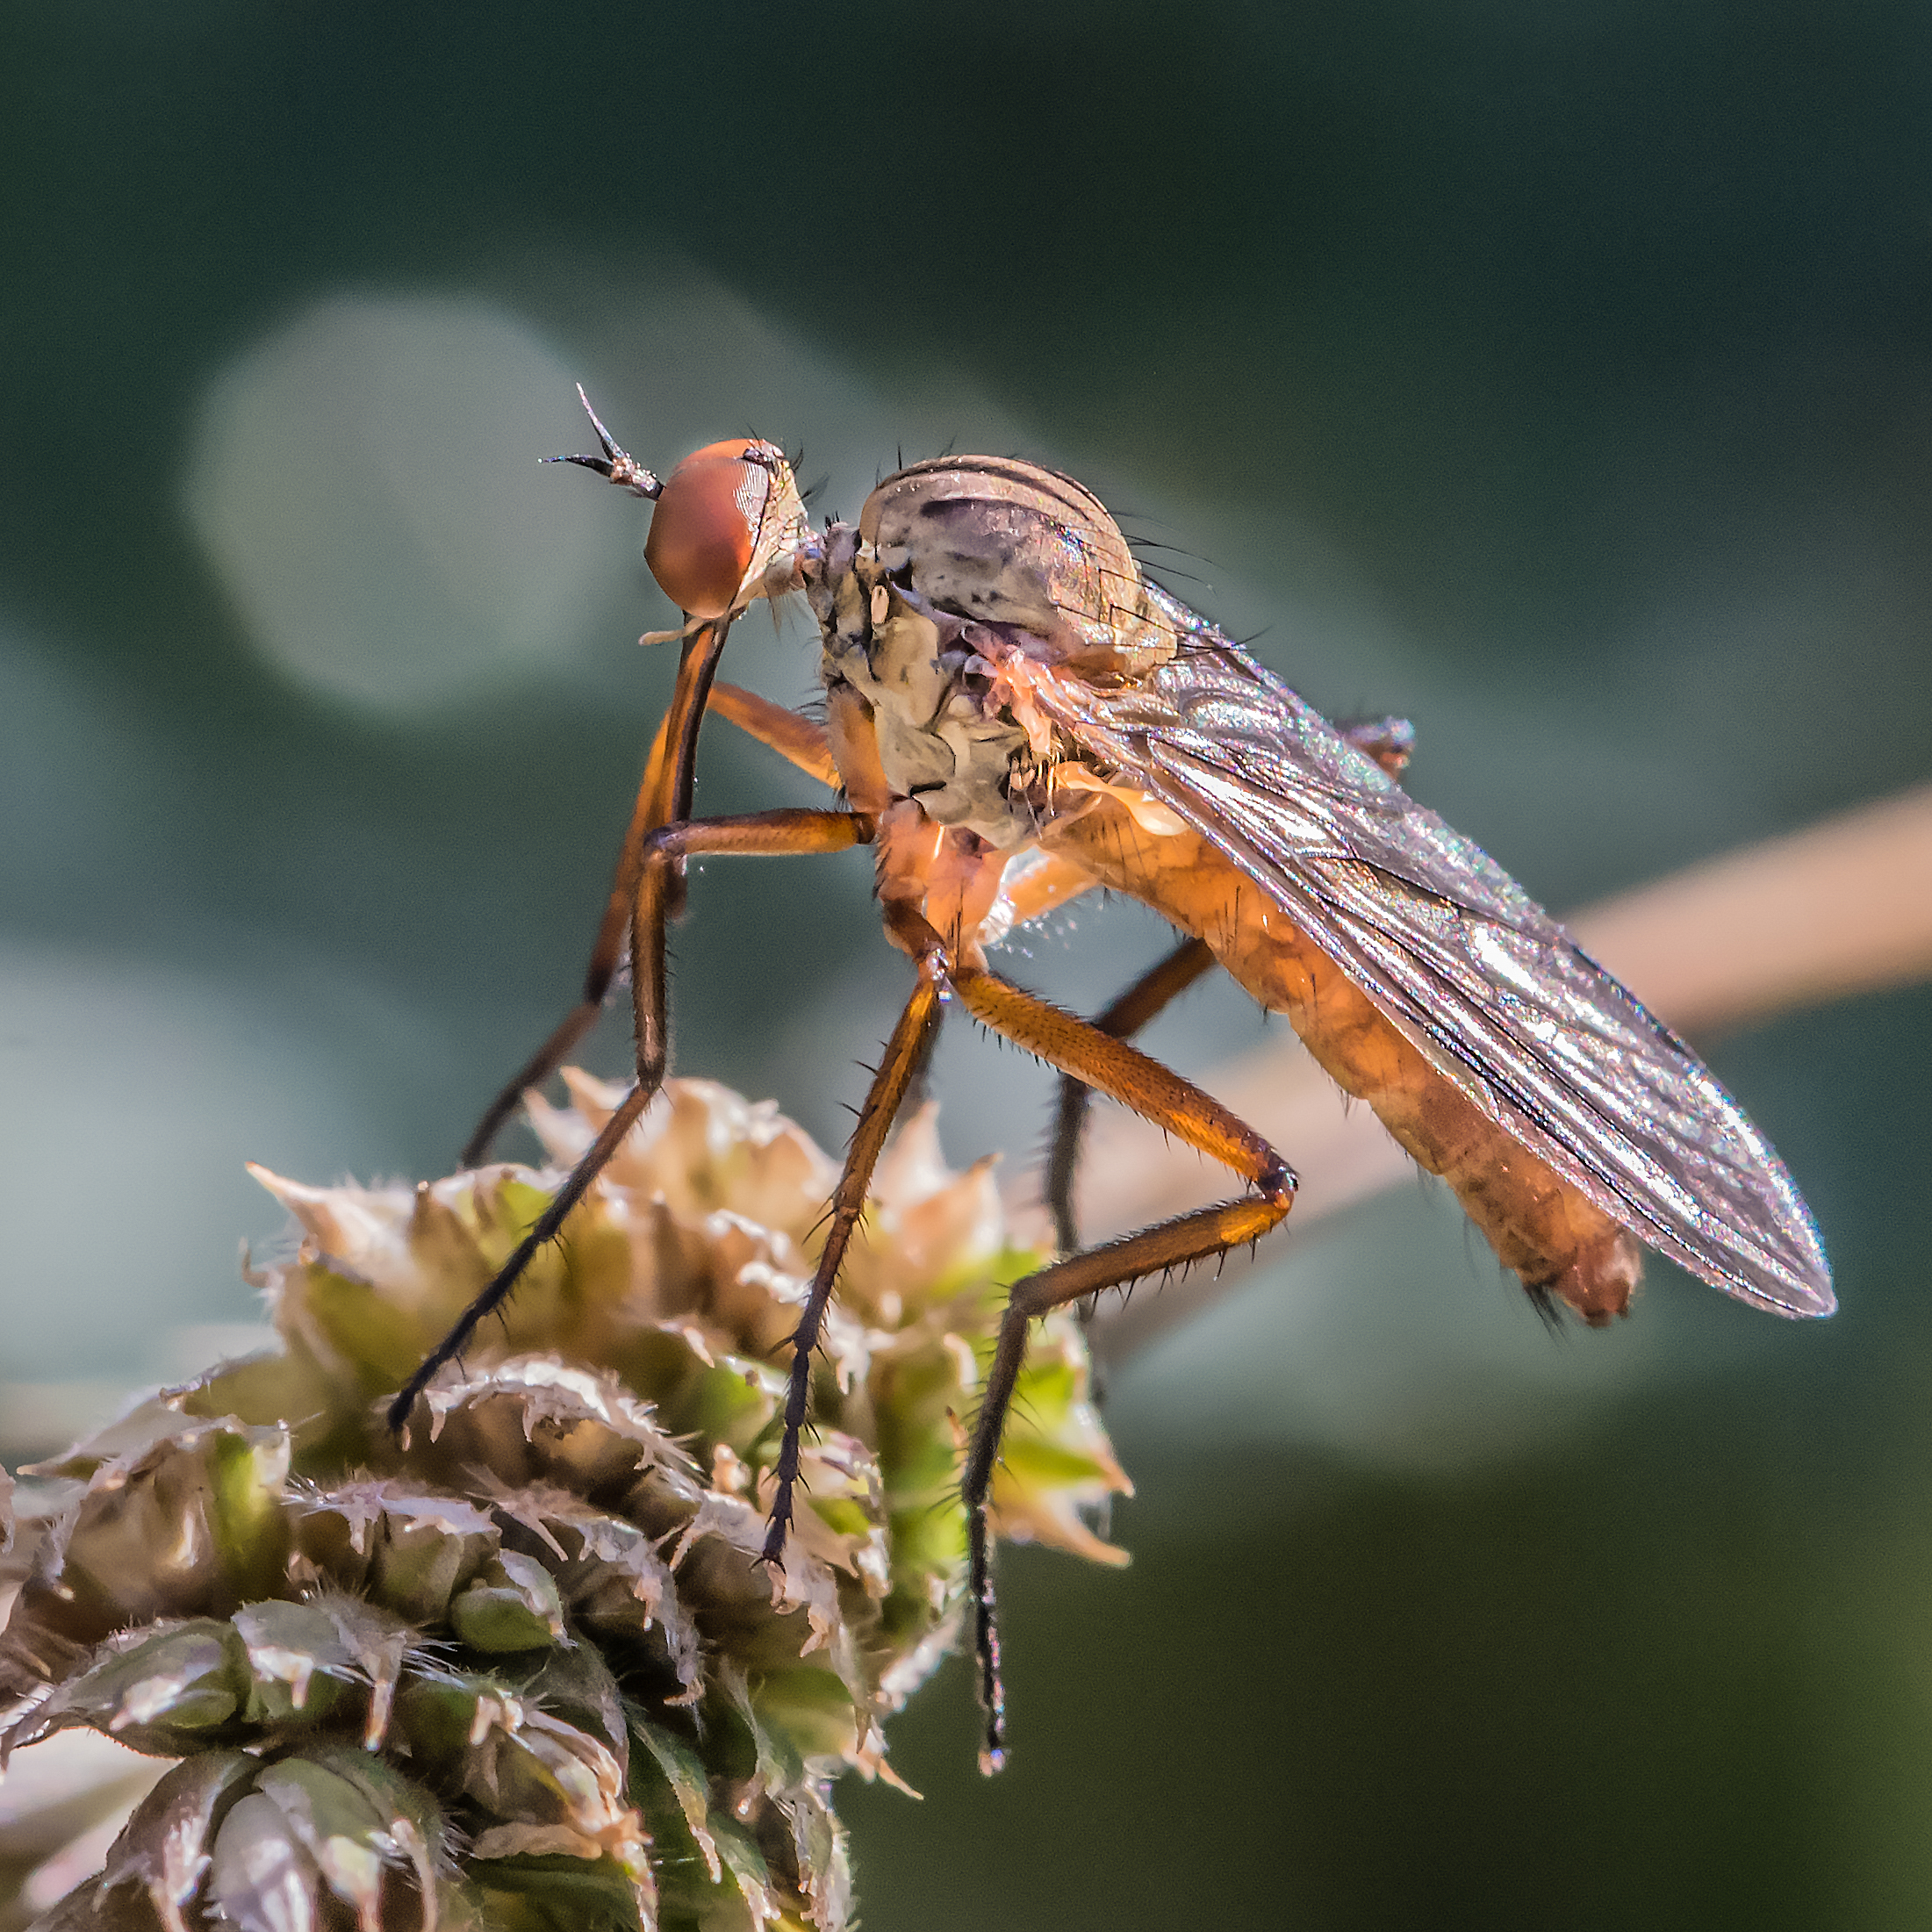 Dagger Fly (Genus: Empis)